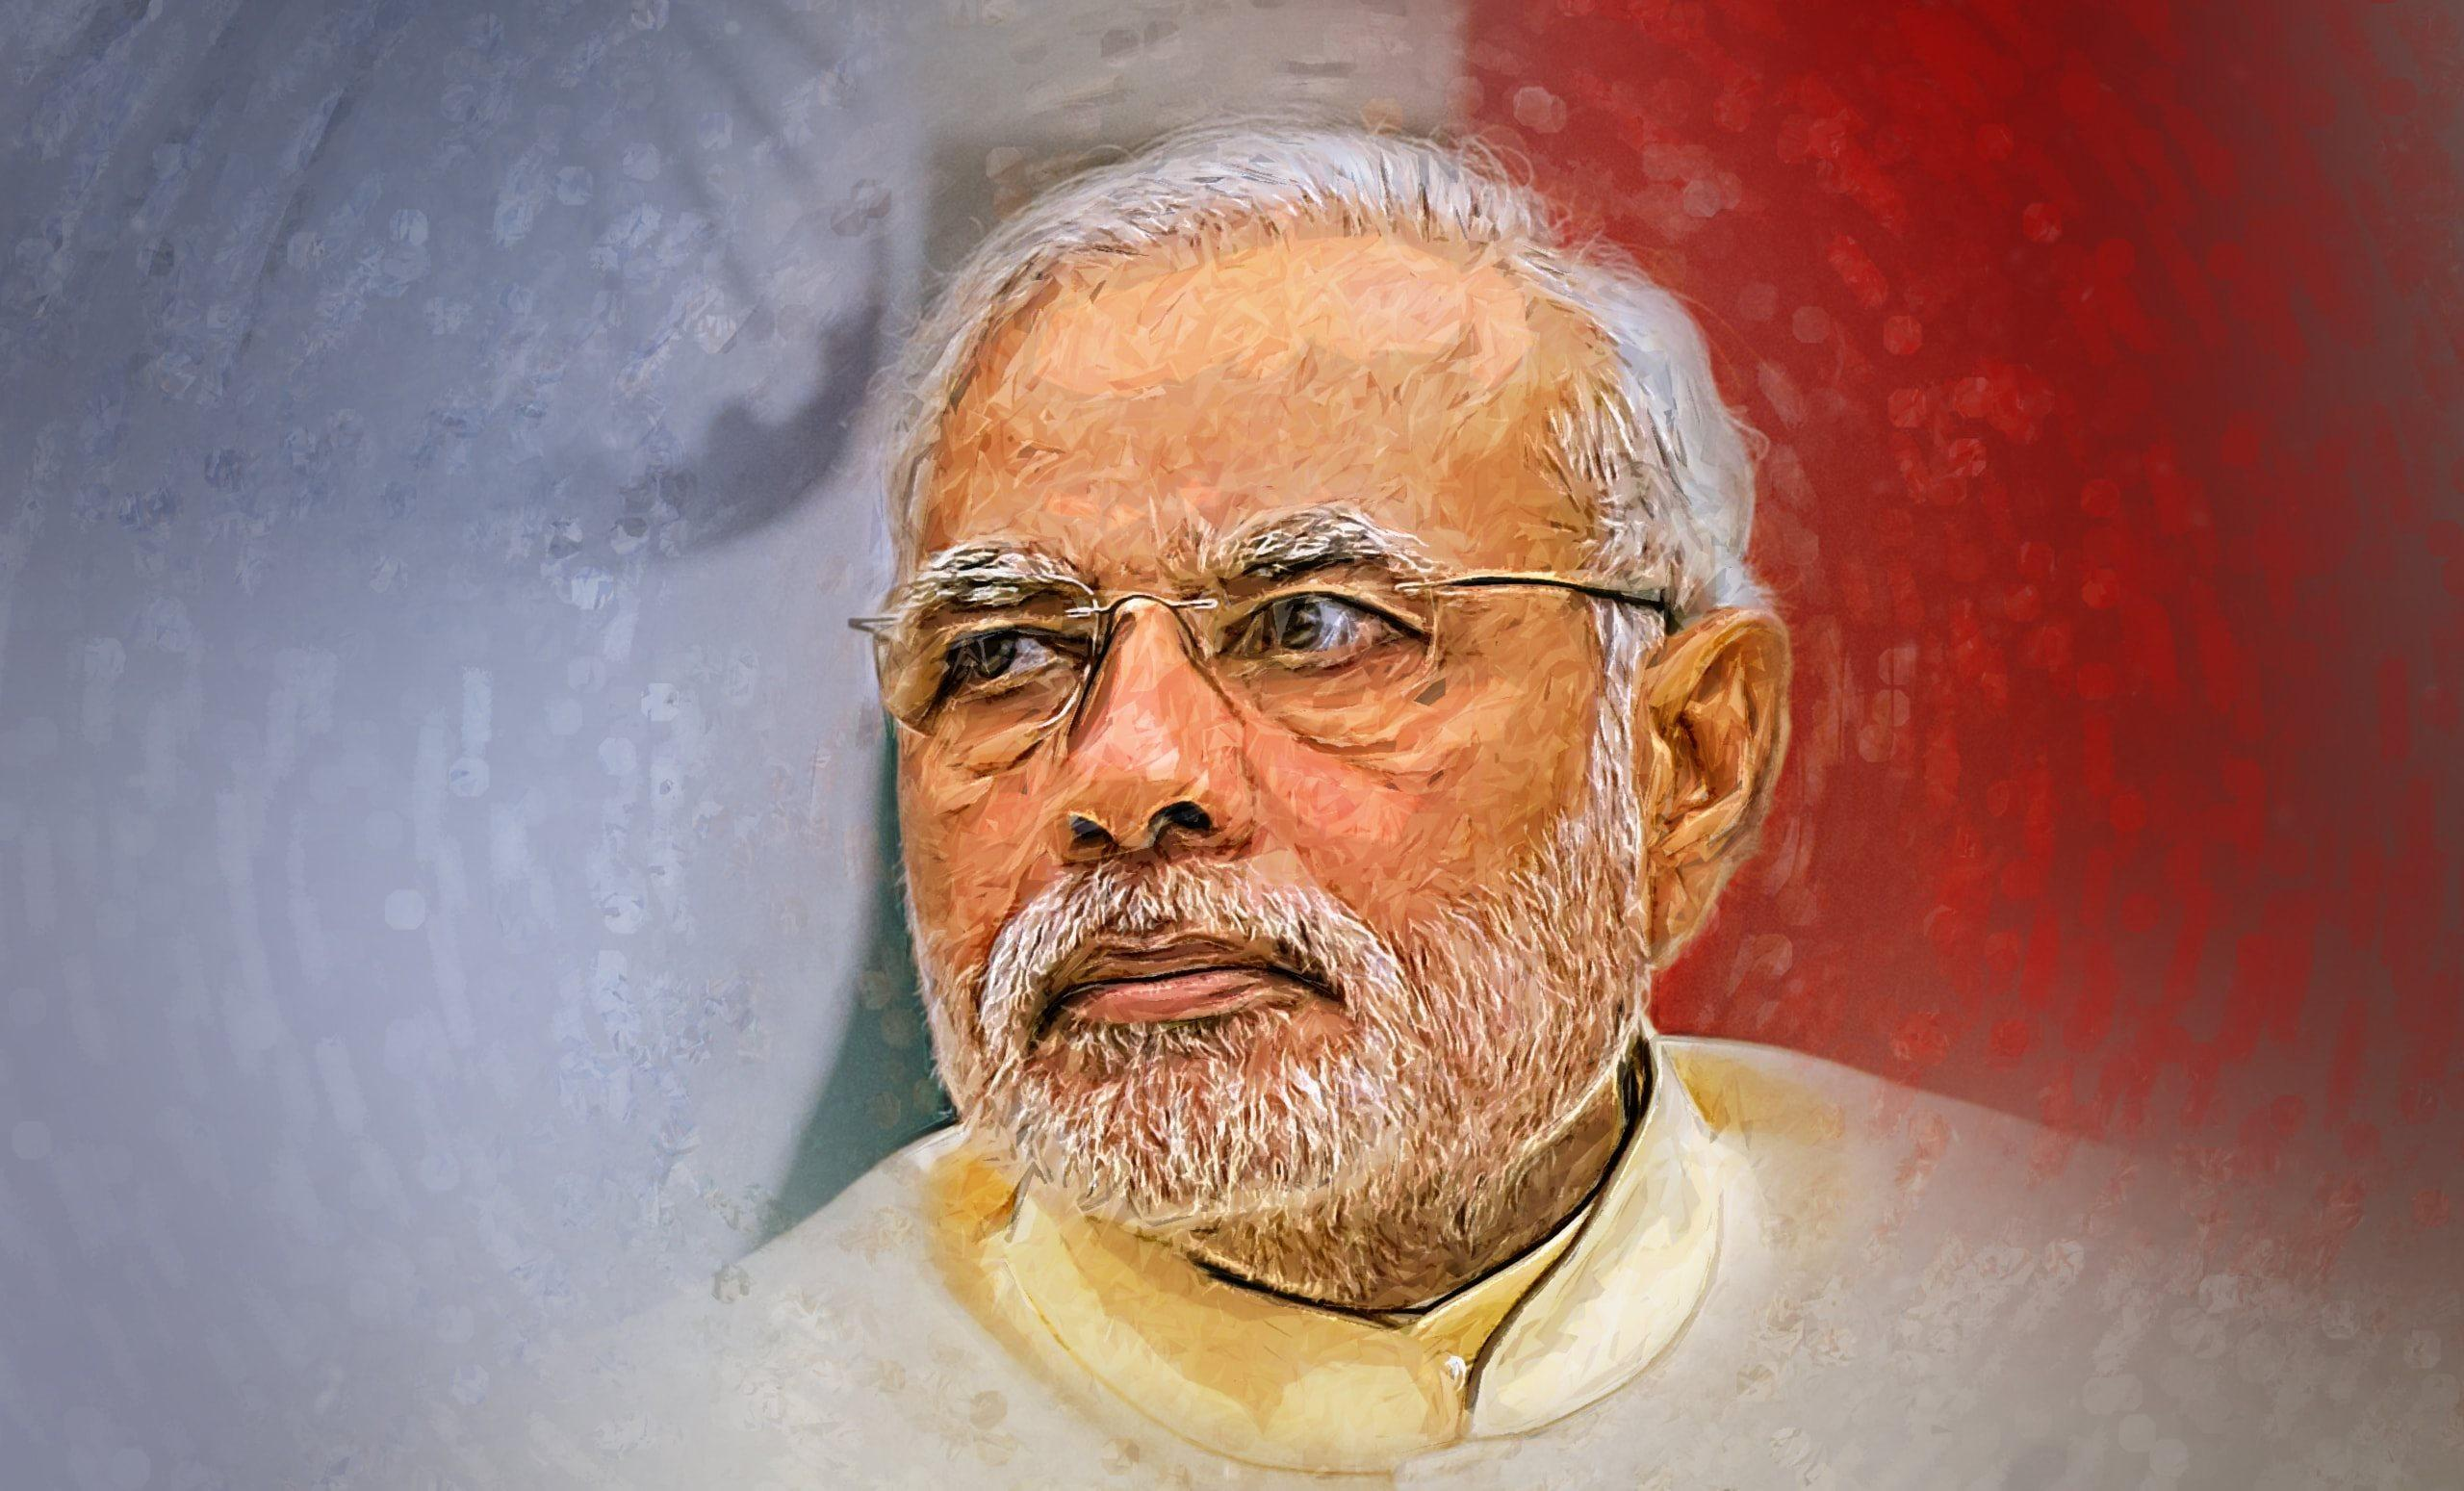 Narendra Modi Wallpapers - Top Free Narendra Modi Backgrounds - WallpaperAccess